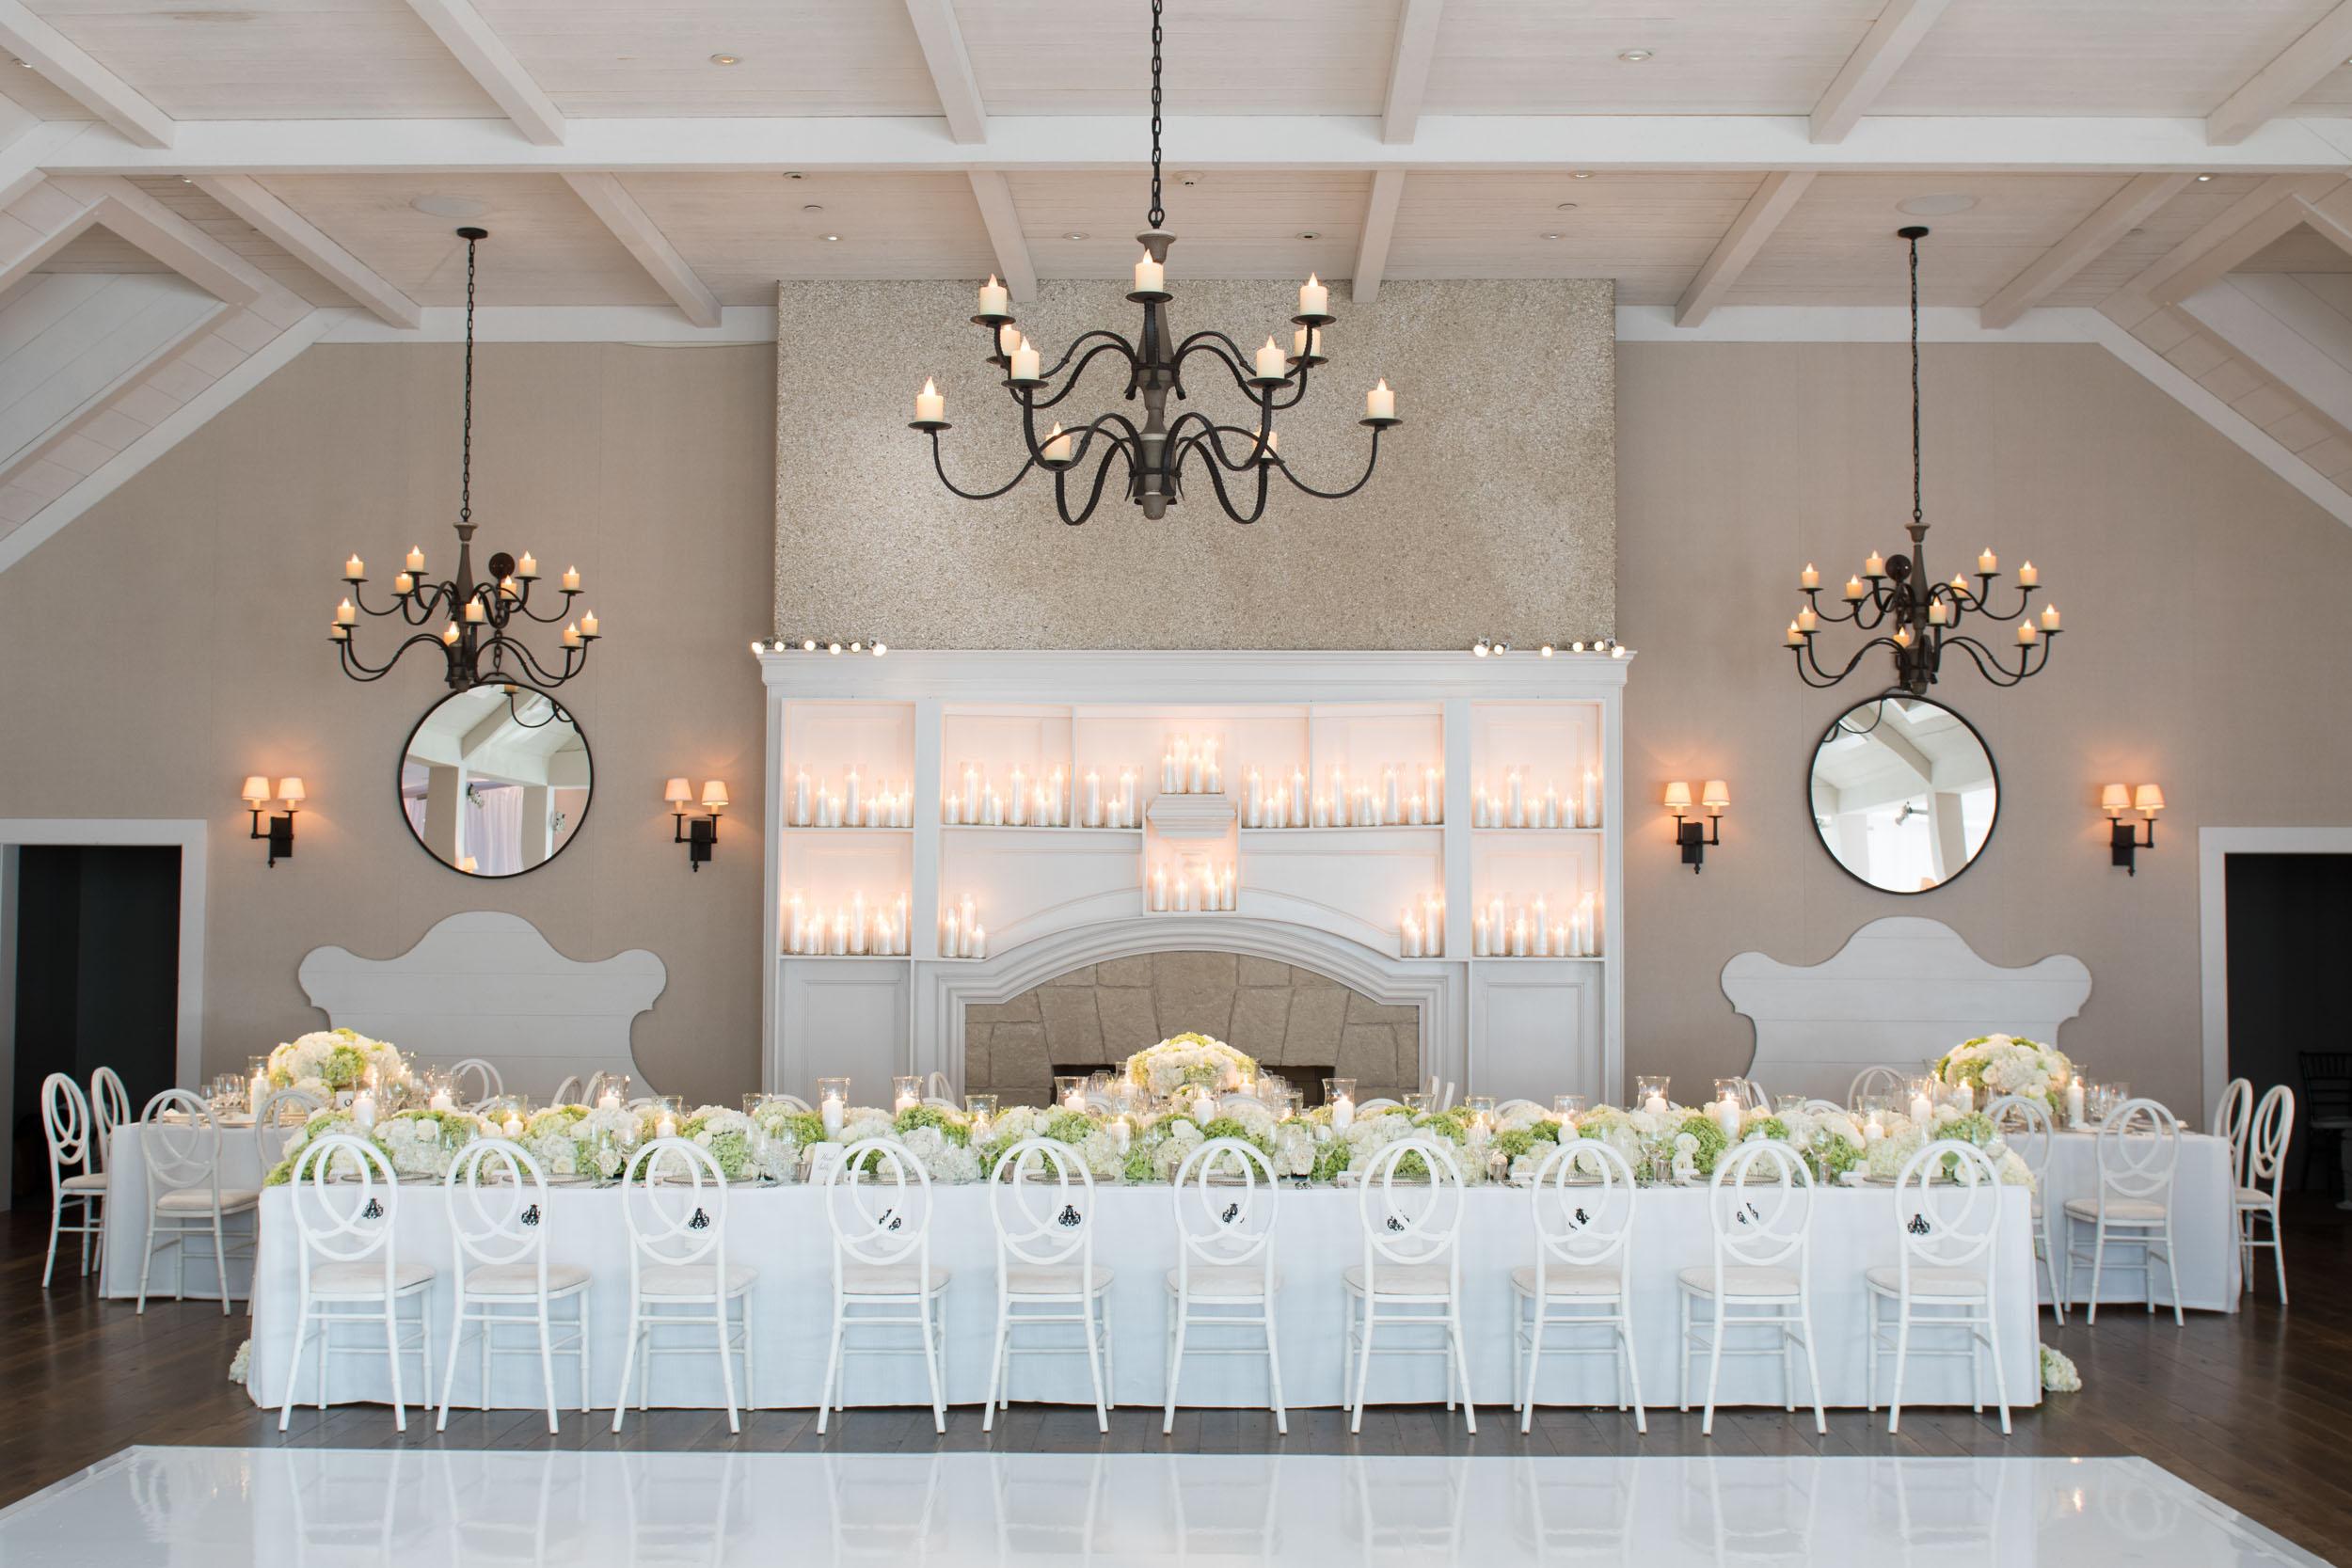 Wedding reception decor at Kiawah Island River Course